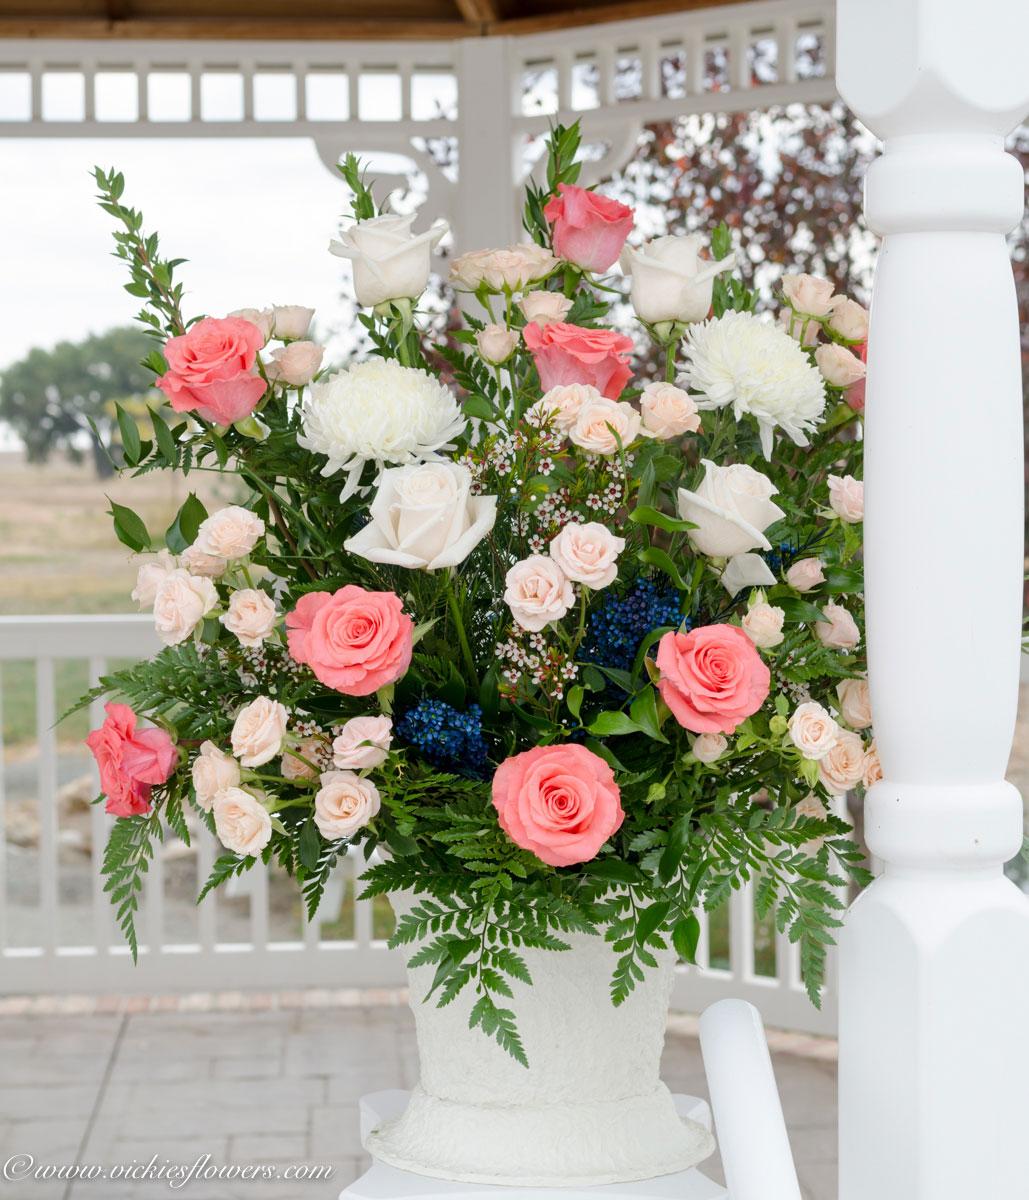 Alter Decorations Wedding Wedding Flowers Vickies Flowers Brighton Colorado Florist